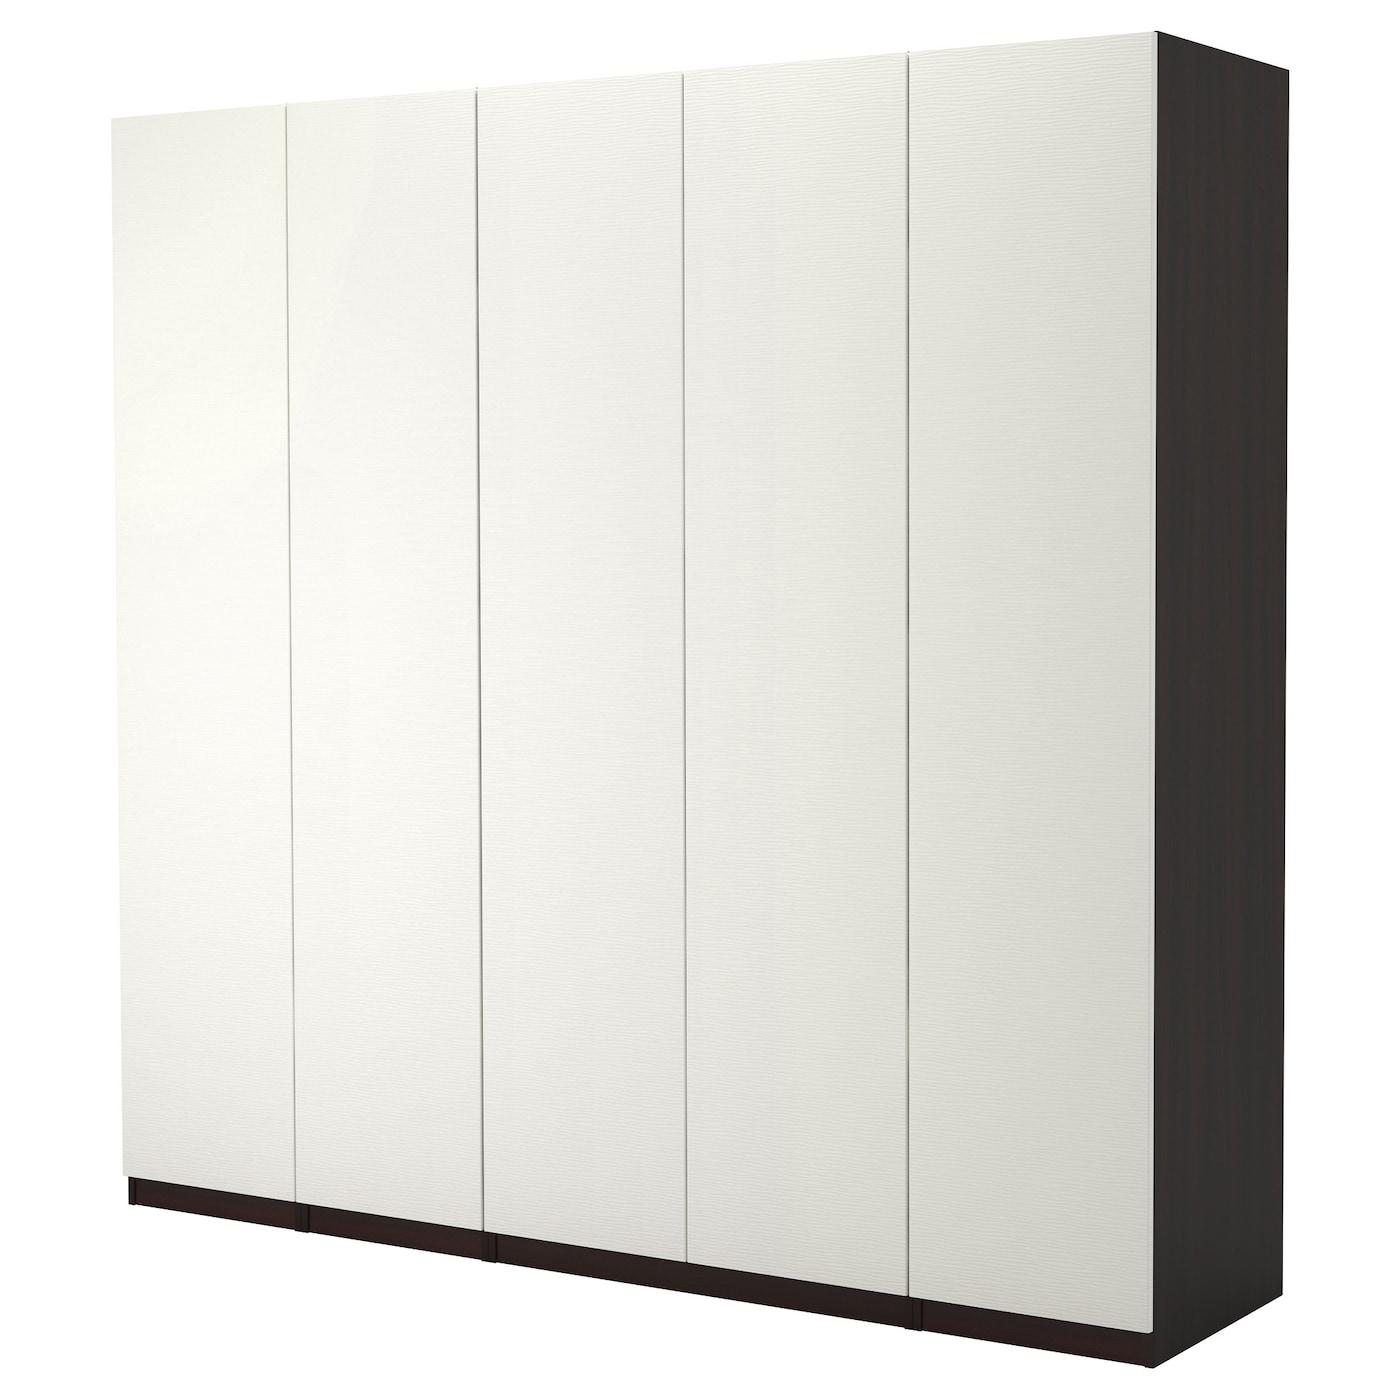 pax armoire penderie brun noir vinterbro blanc 250x60x236. Black Bedroom Furniture Sets. Home Design Ideas